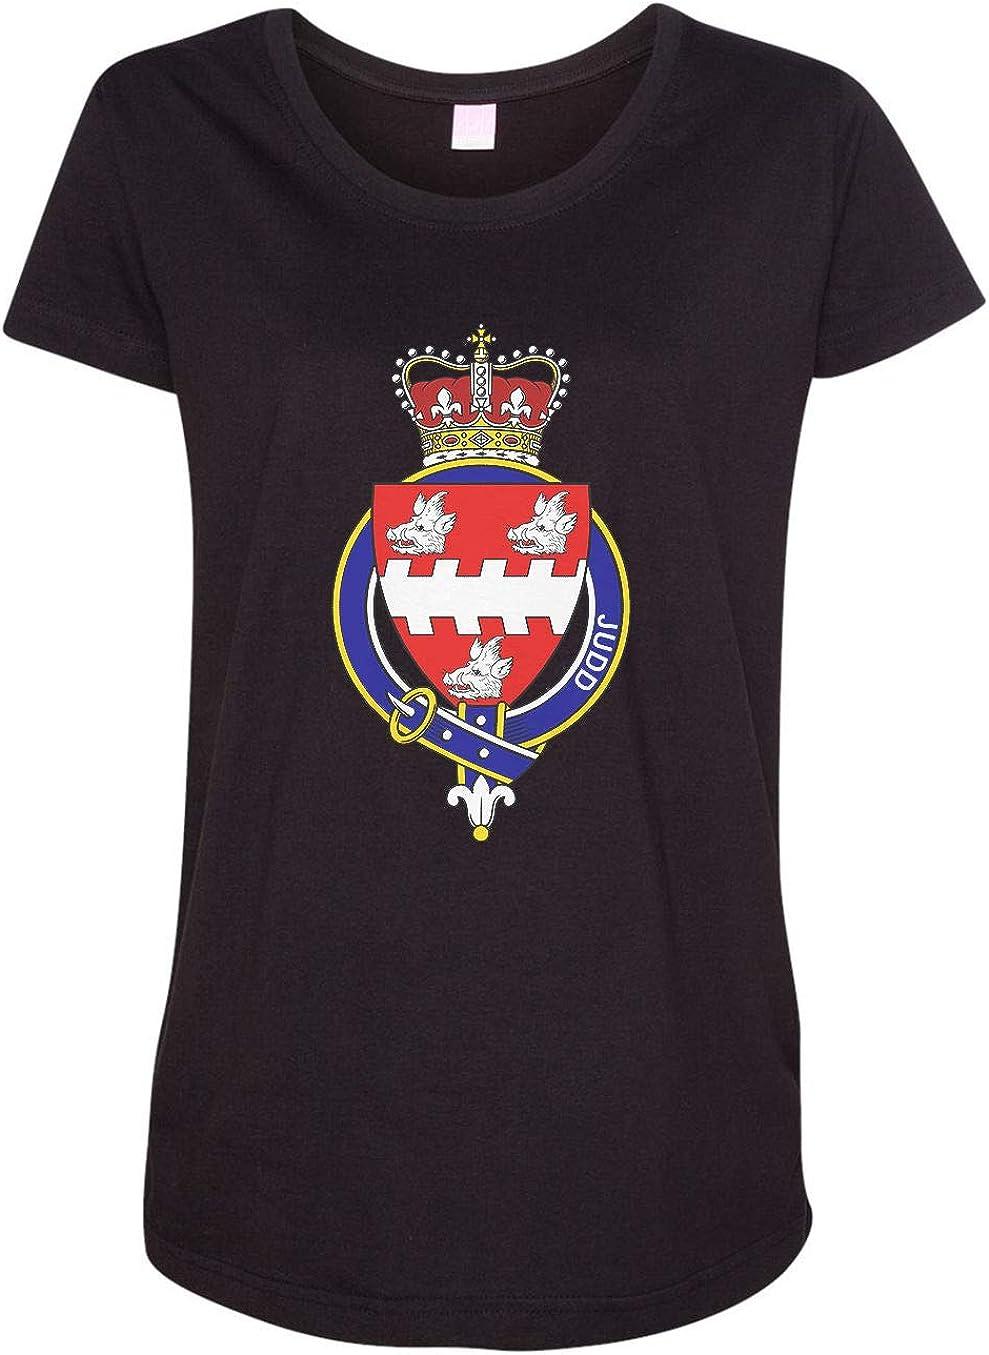 HARD EDGE DESIGN Women's English Garter Family Judd T-Shirt